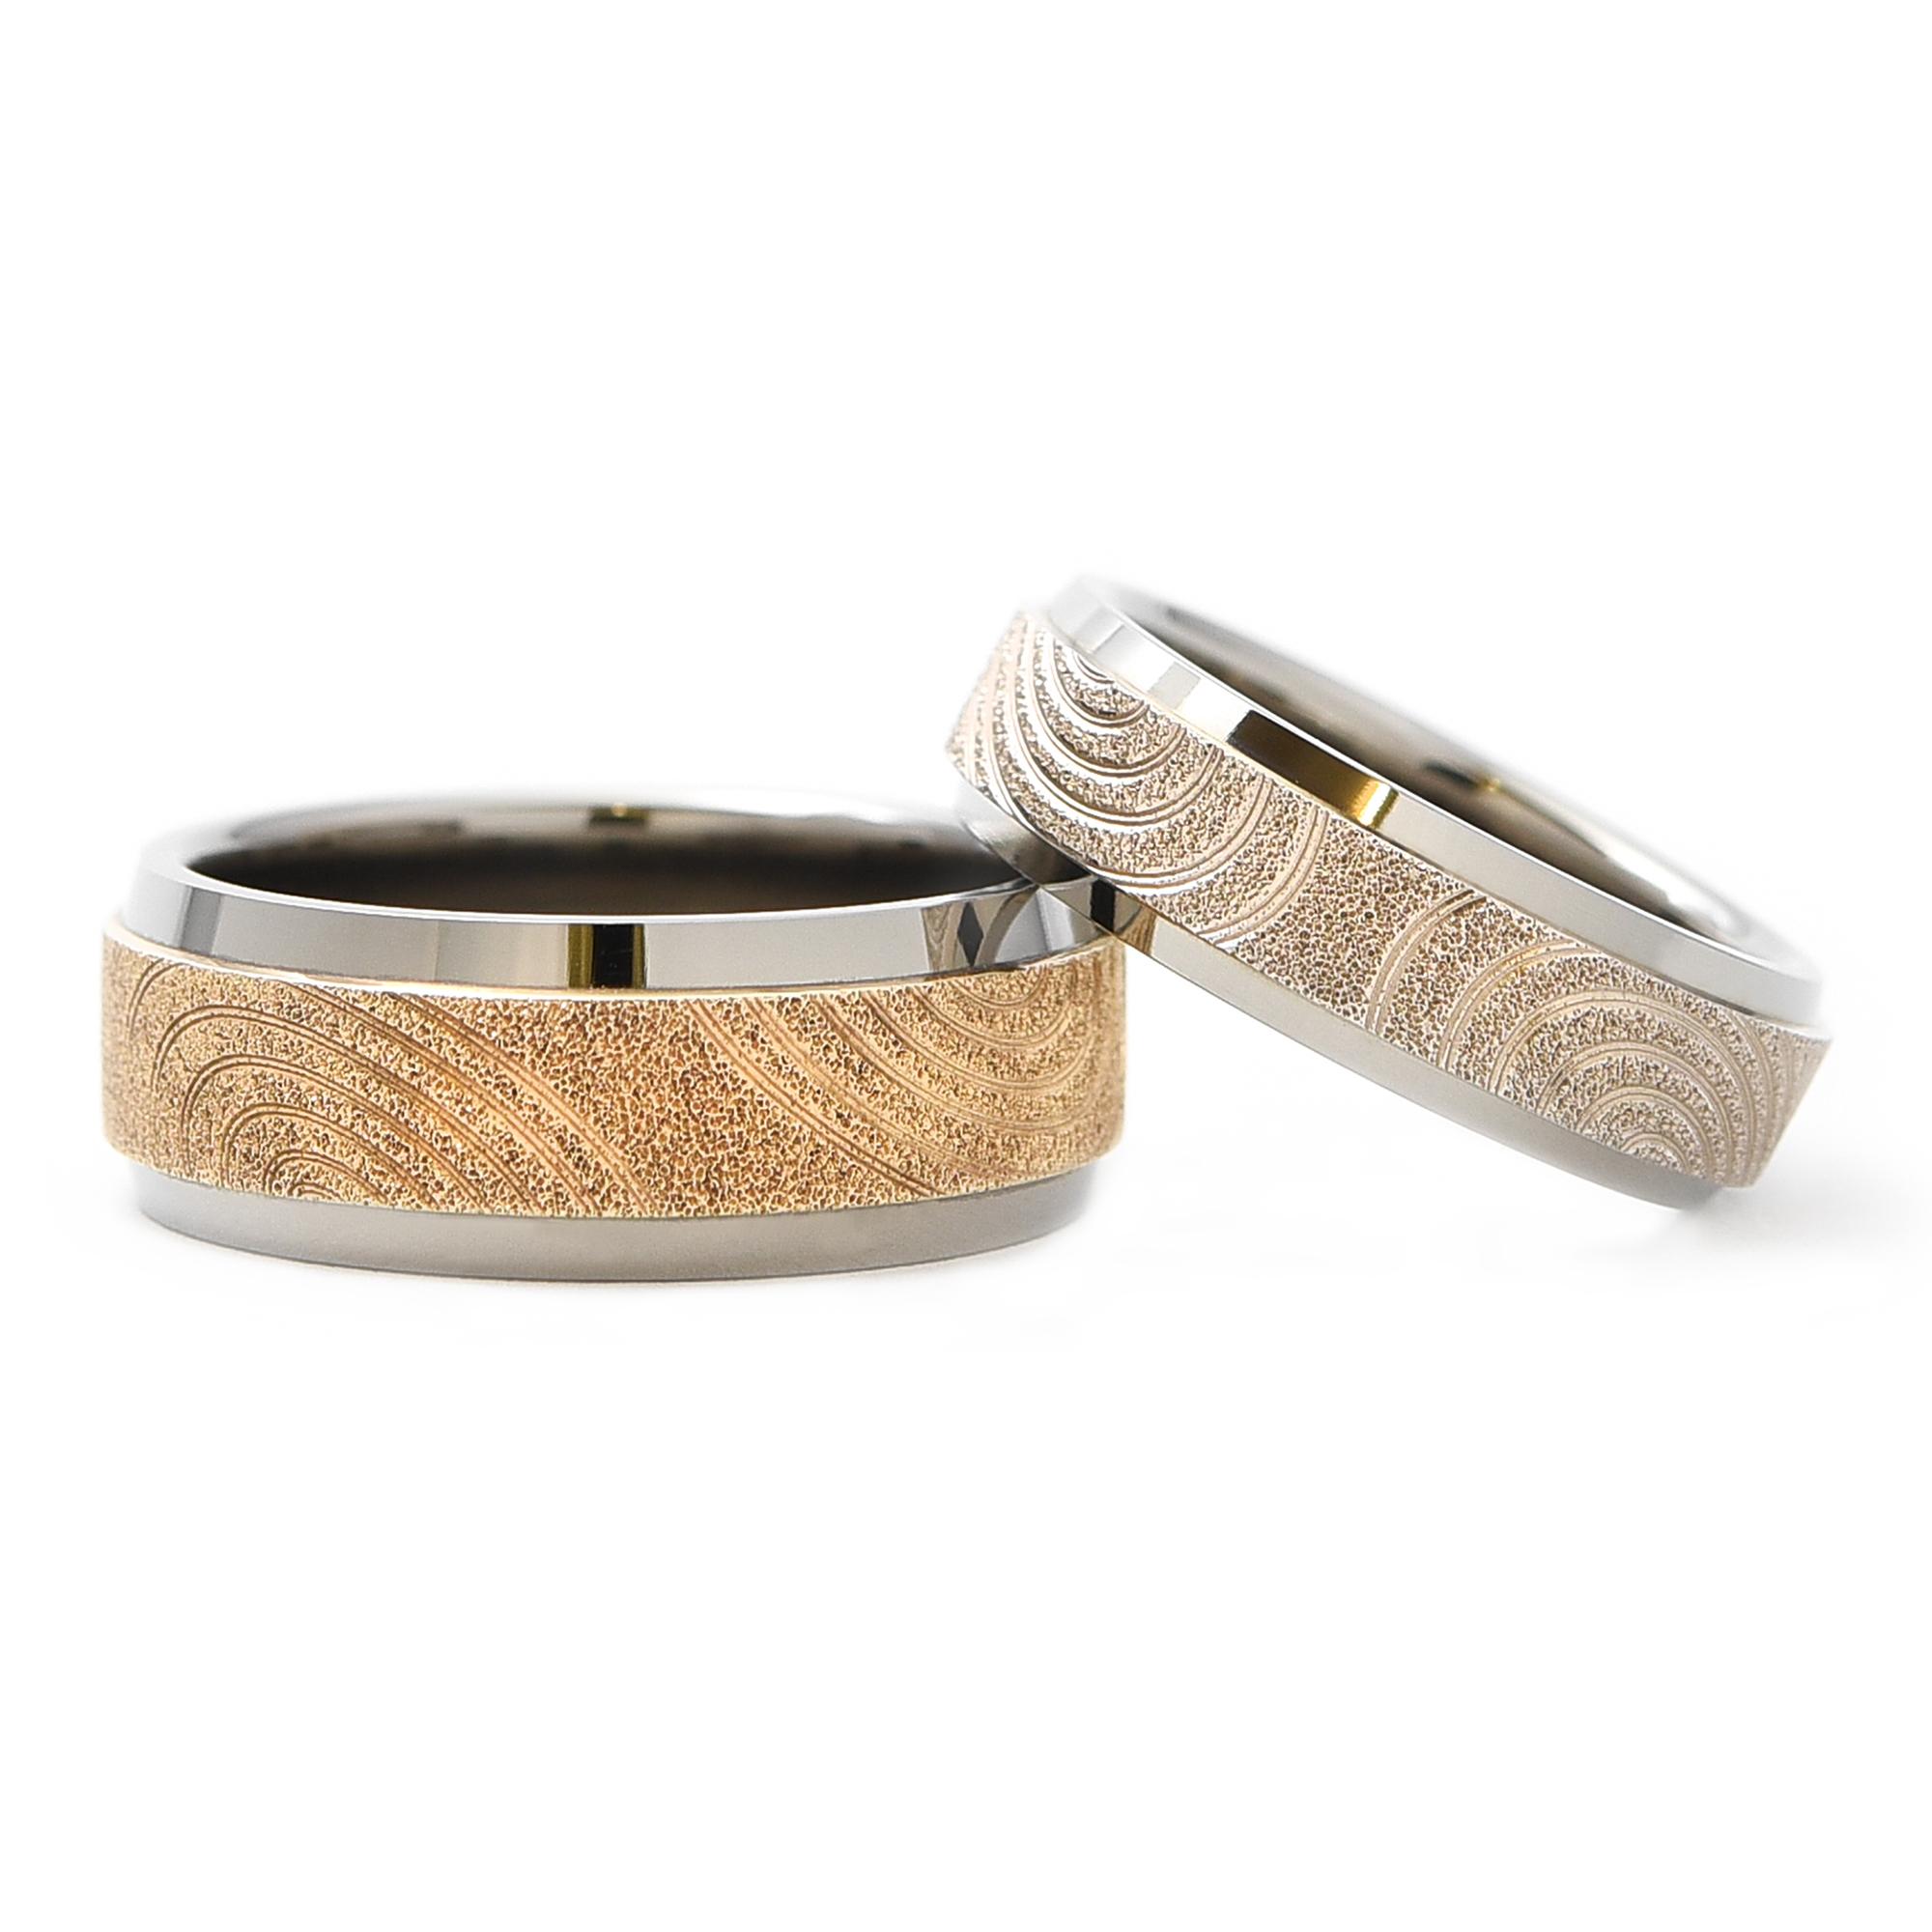 輪高崎工房の結婚指輪|HR-226